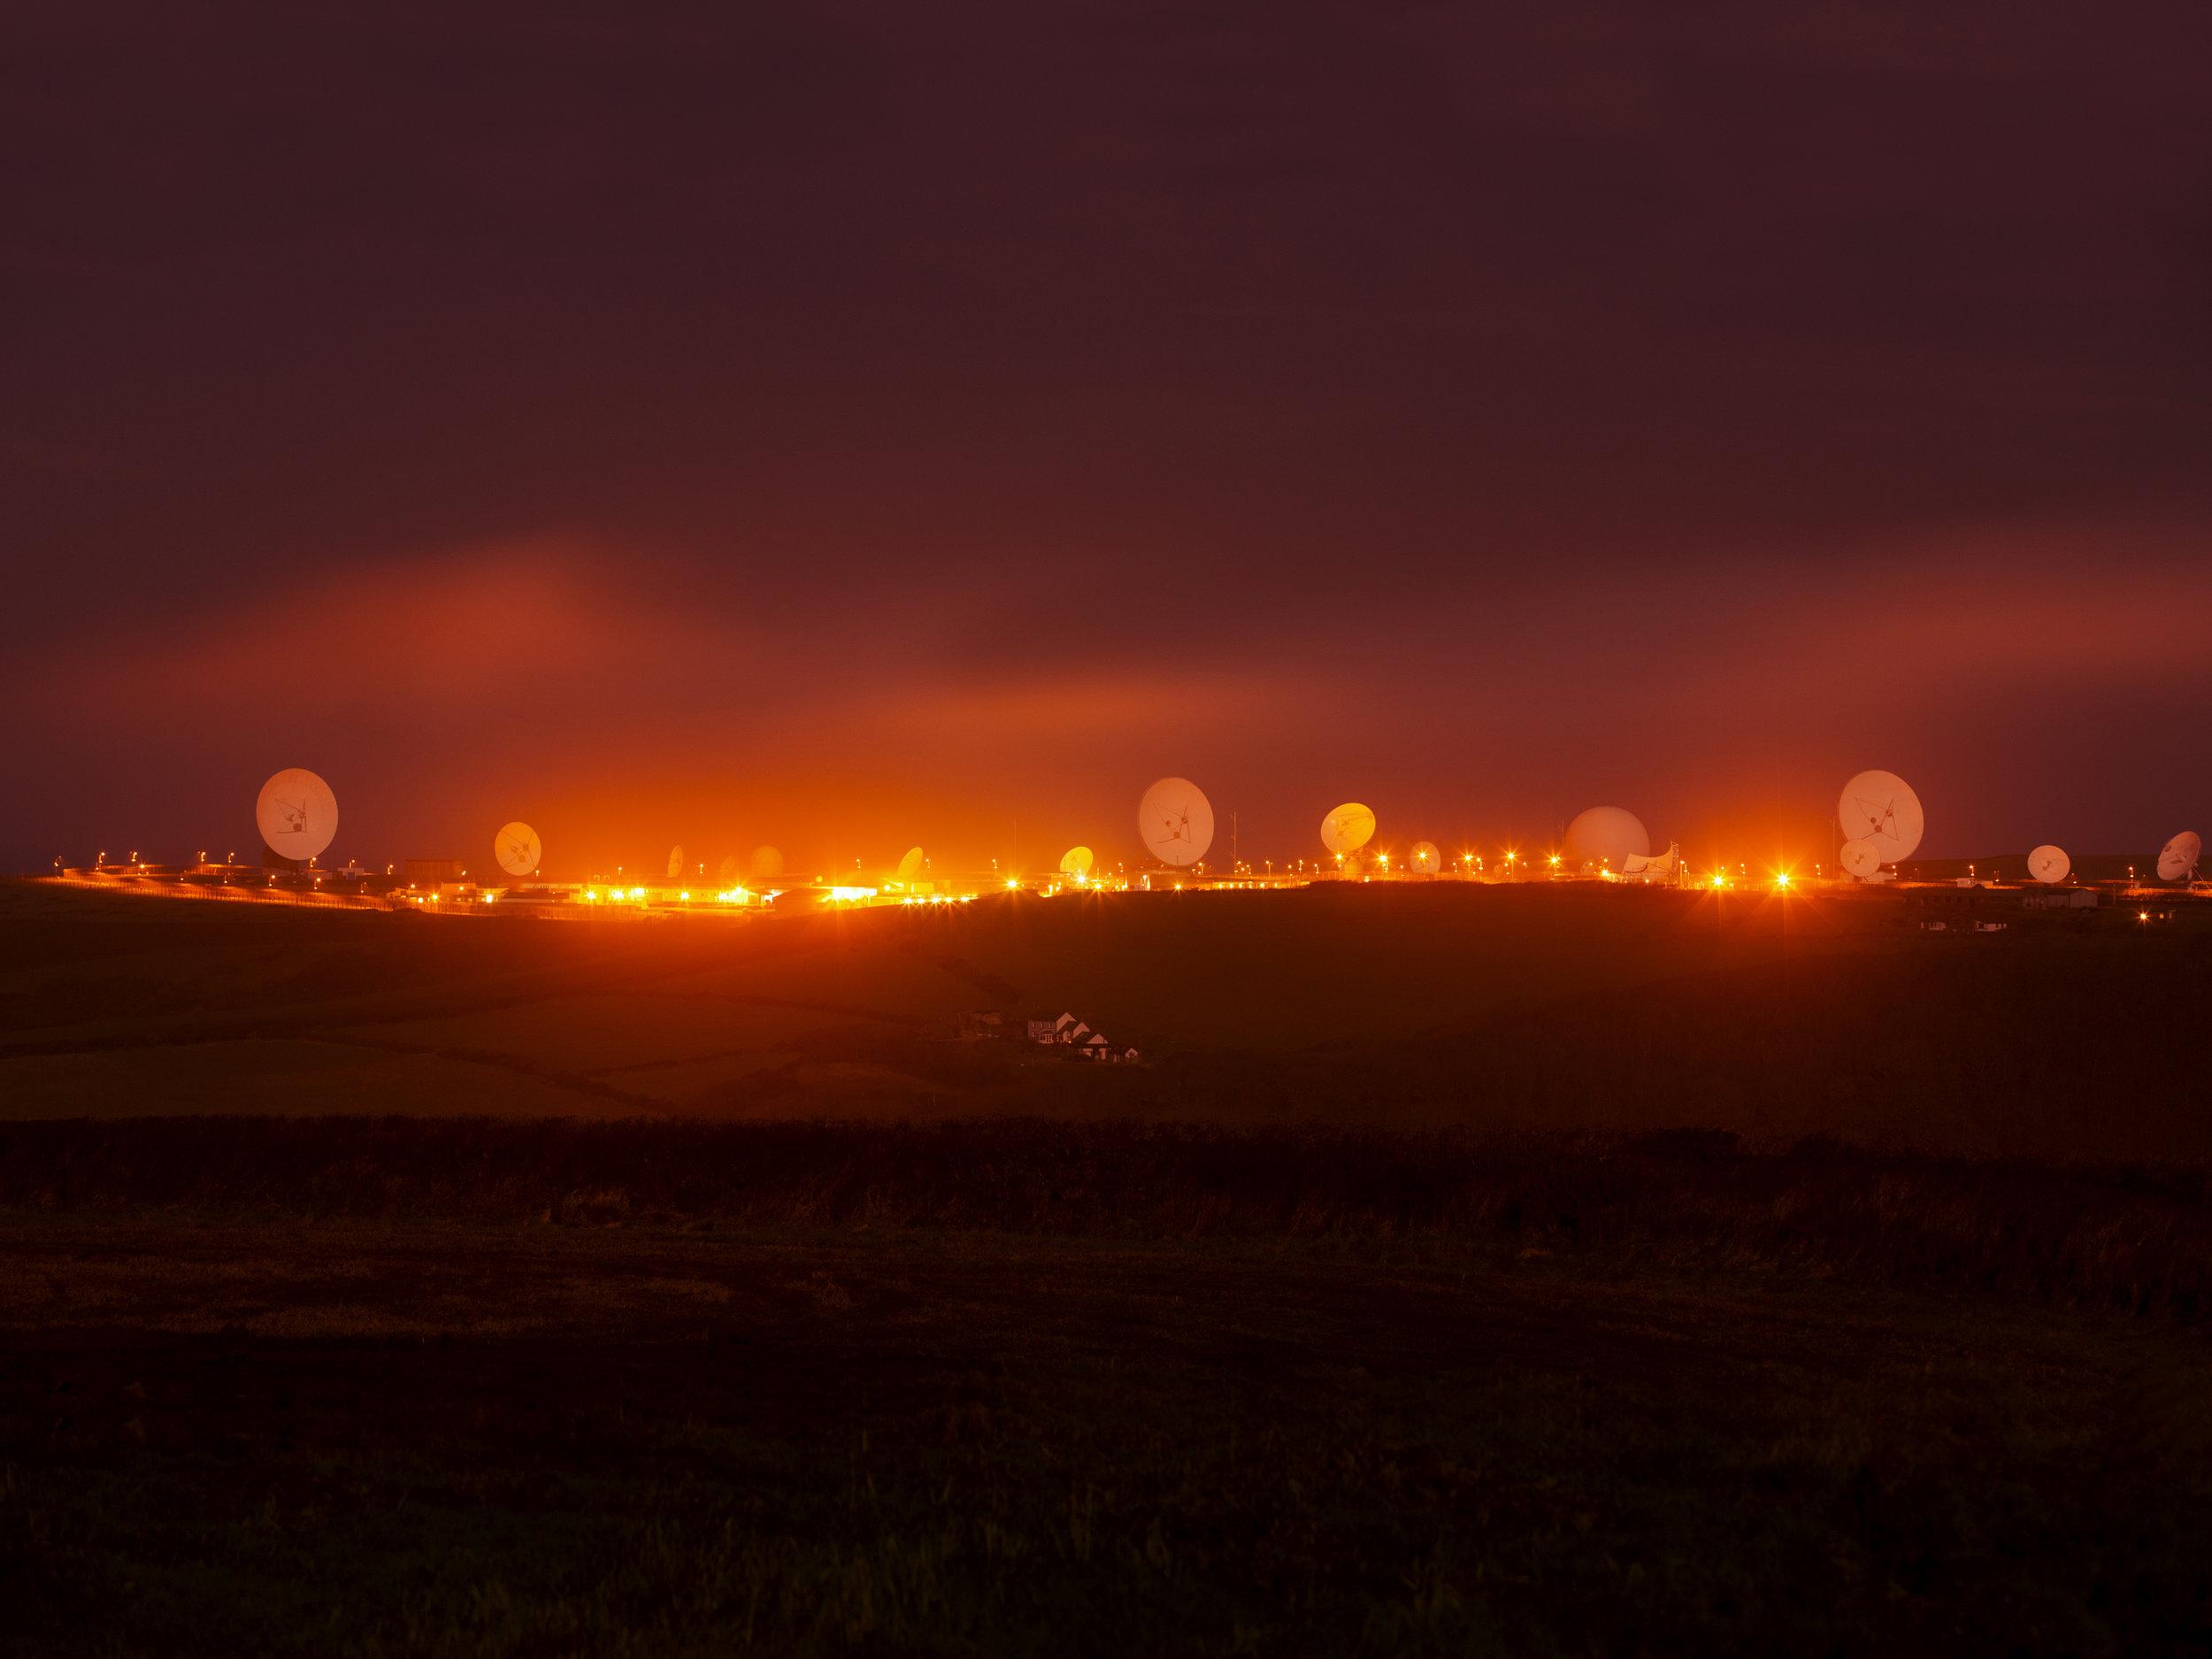 Trevor Paglen, NSA/GCHQ Surveillance Base, Bude, Cornwall, UK, 2014